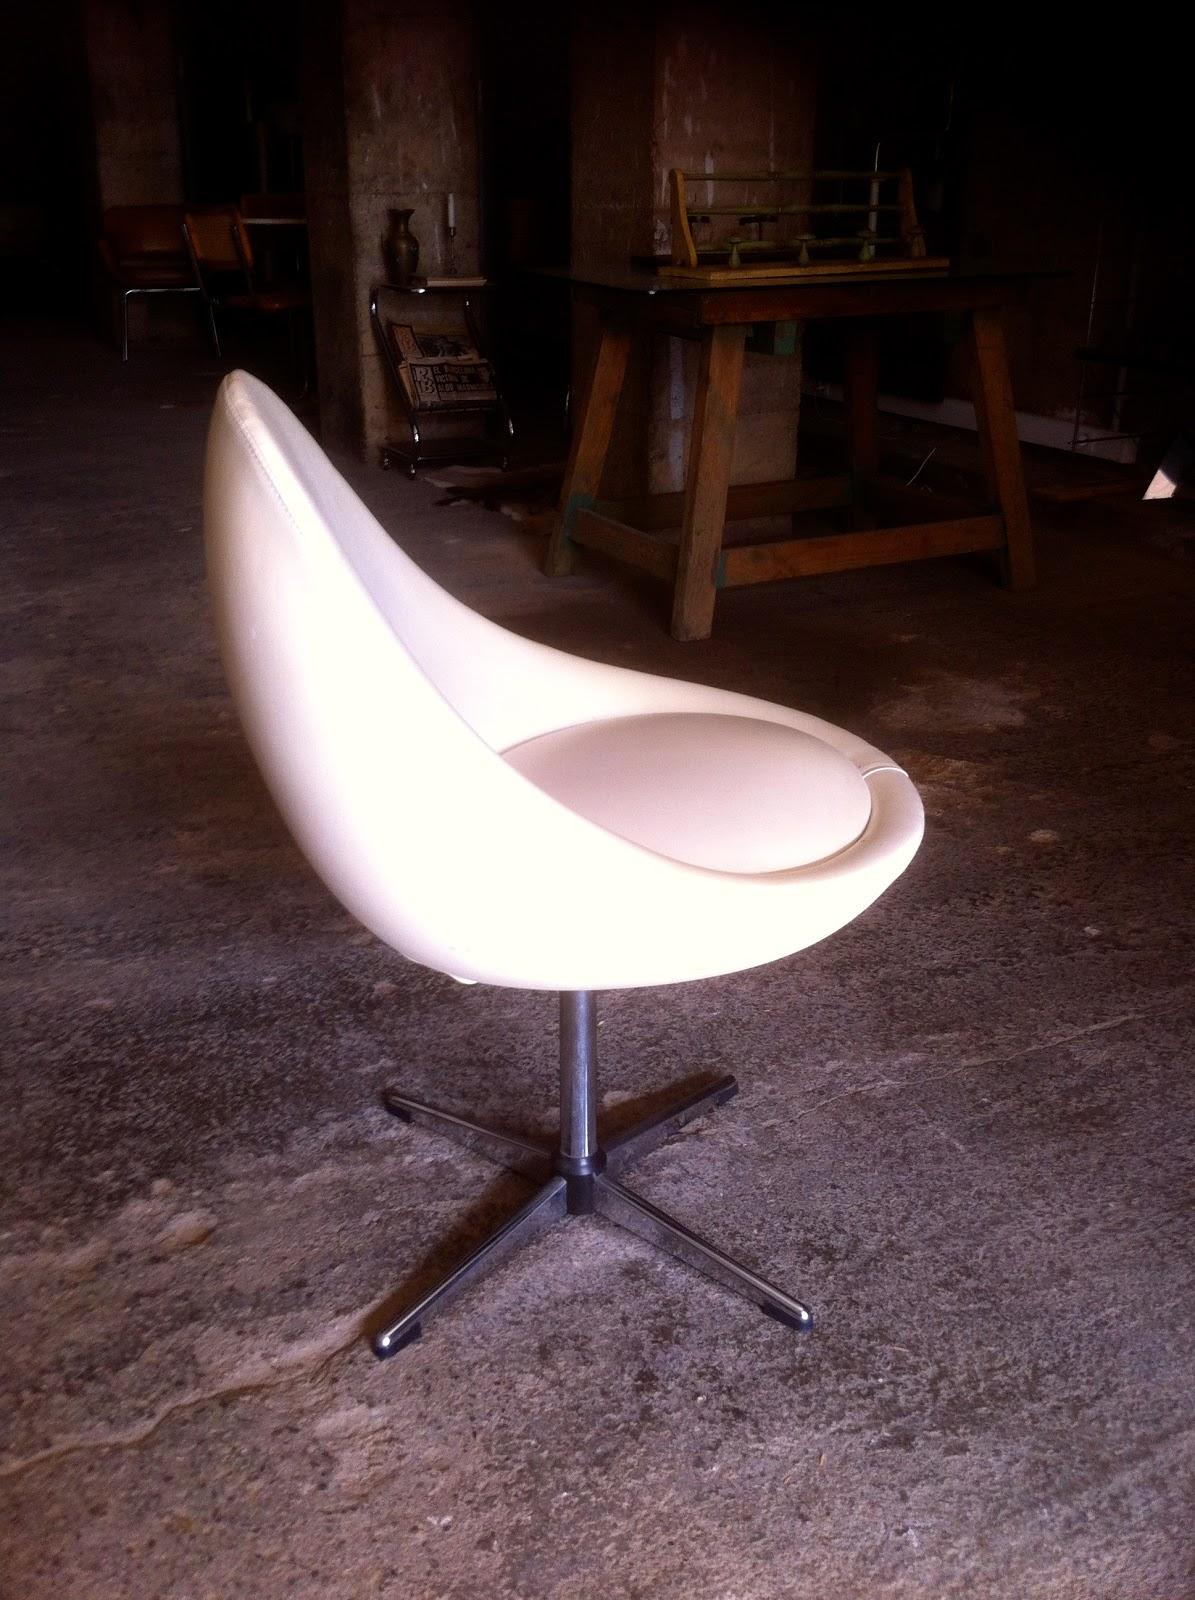 Encantsvintage silla estilo huevo egg chair for Silla huevo precio